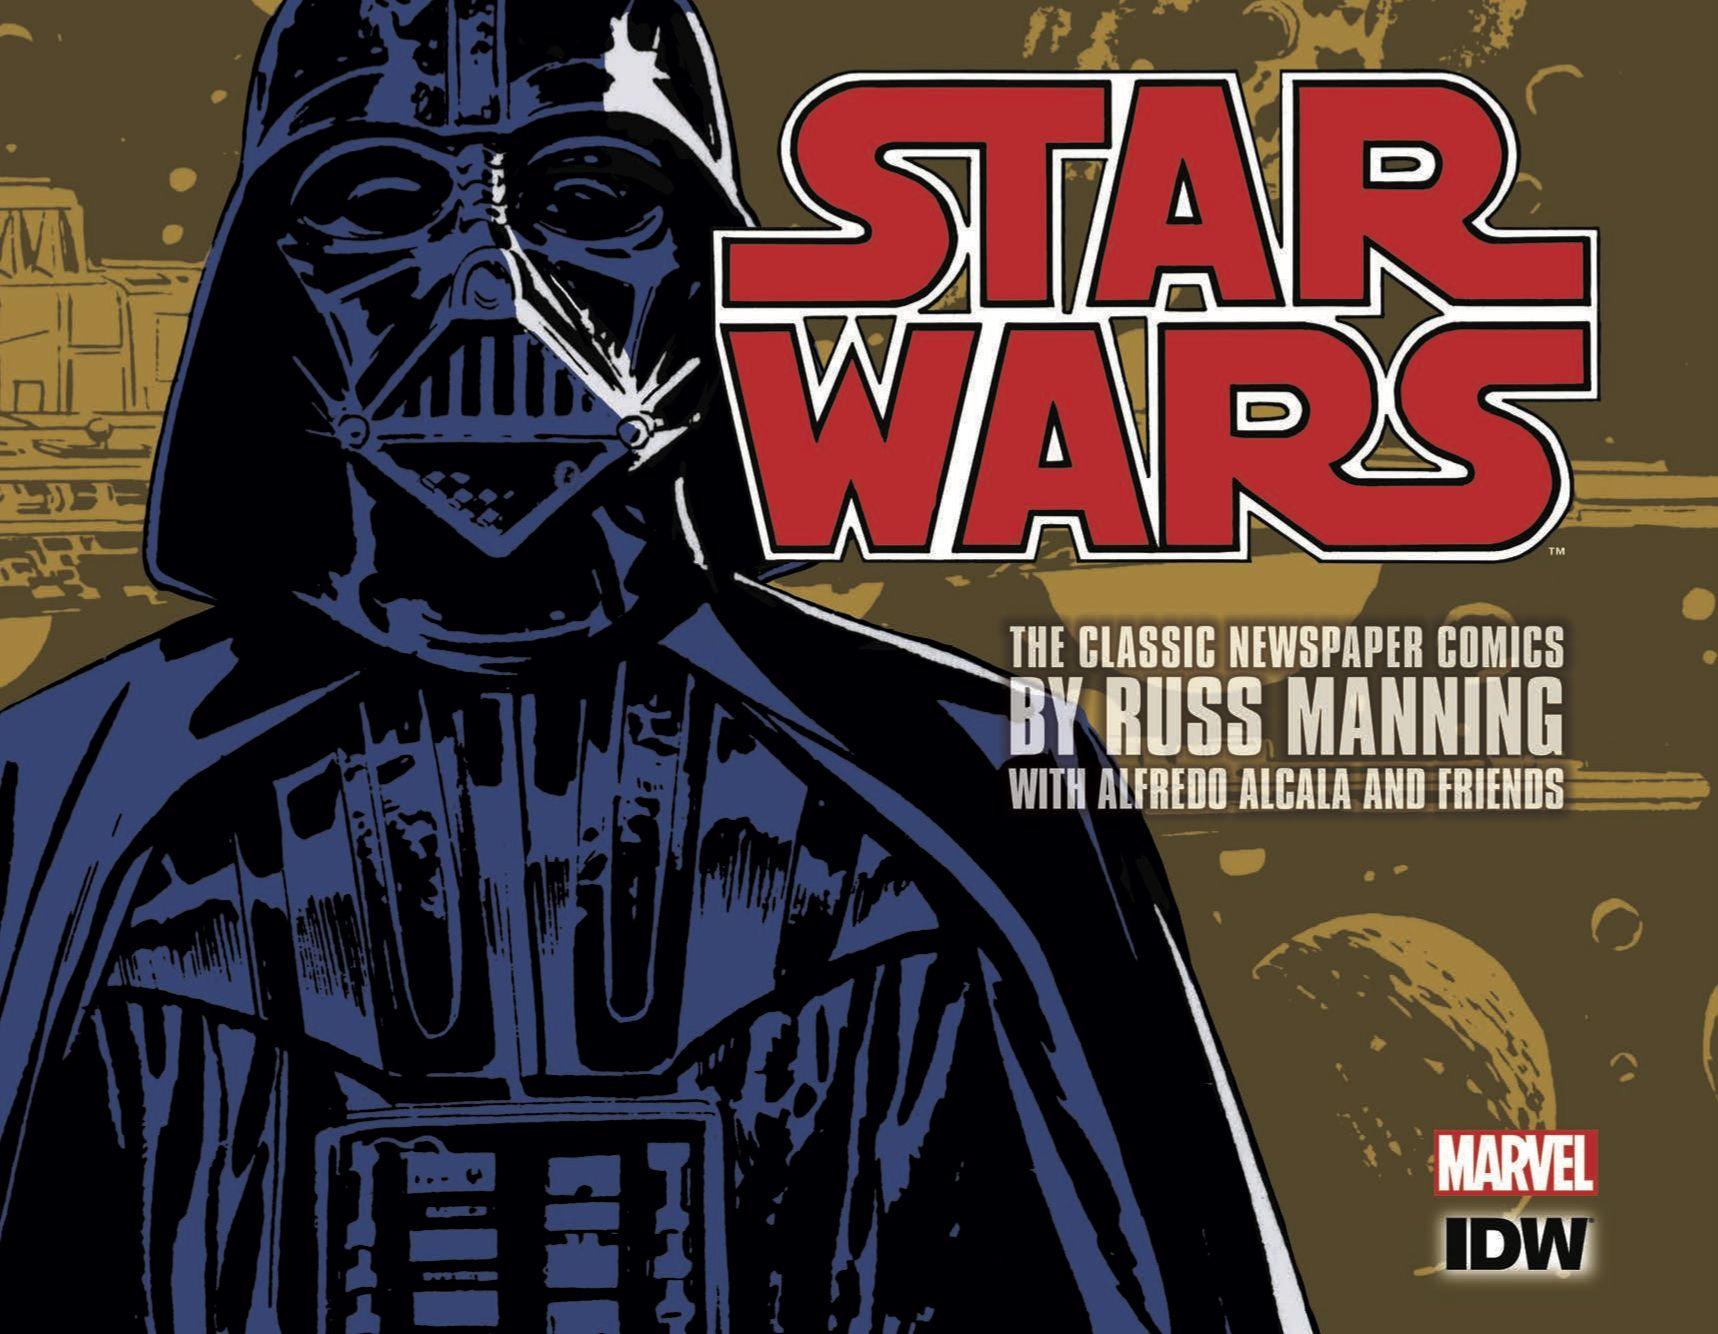 Friday Reads: Star Wars The Classic Newspaper Comics Vol.1